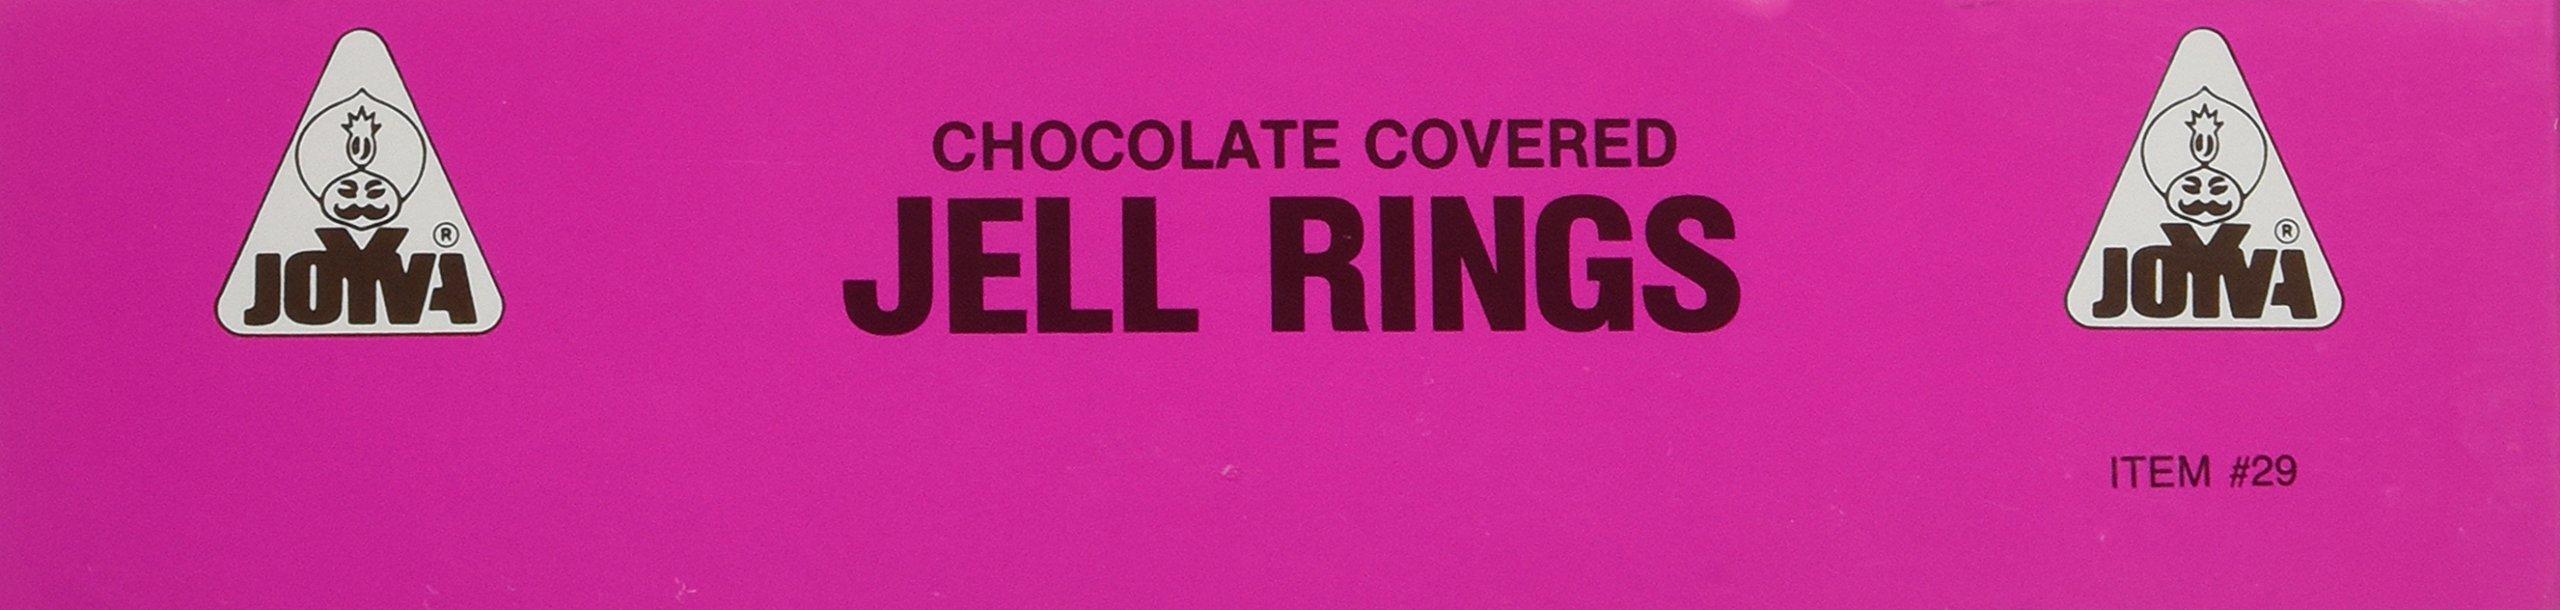 Chocolate Covered Jelly Rings by Joyva 5lbs by Joyva (Image #5)